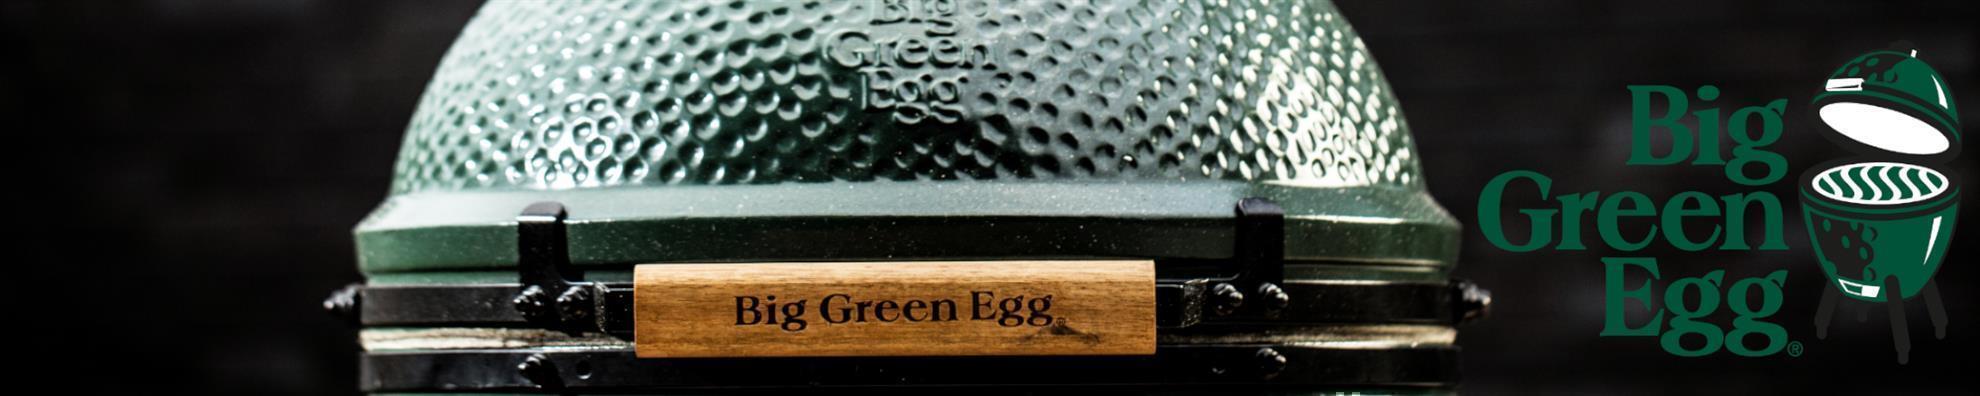 Big Green Egg - Gussrost für Medium